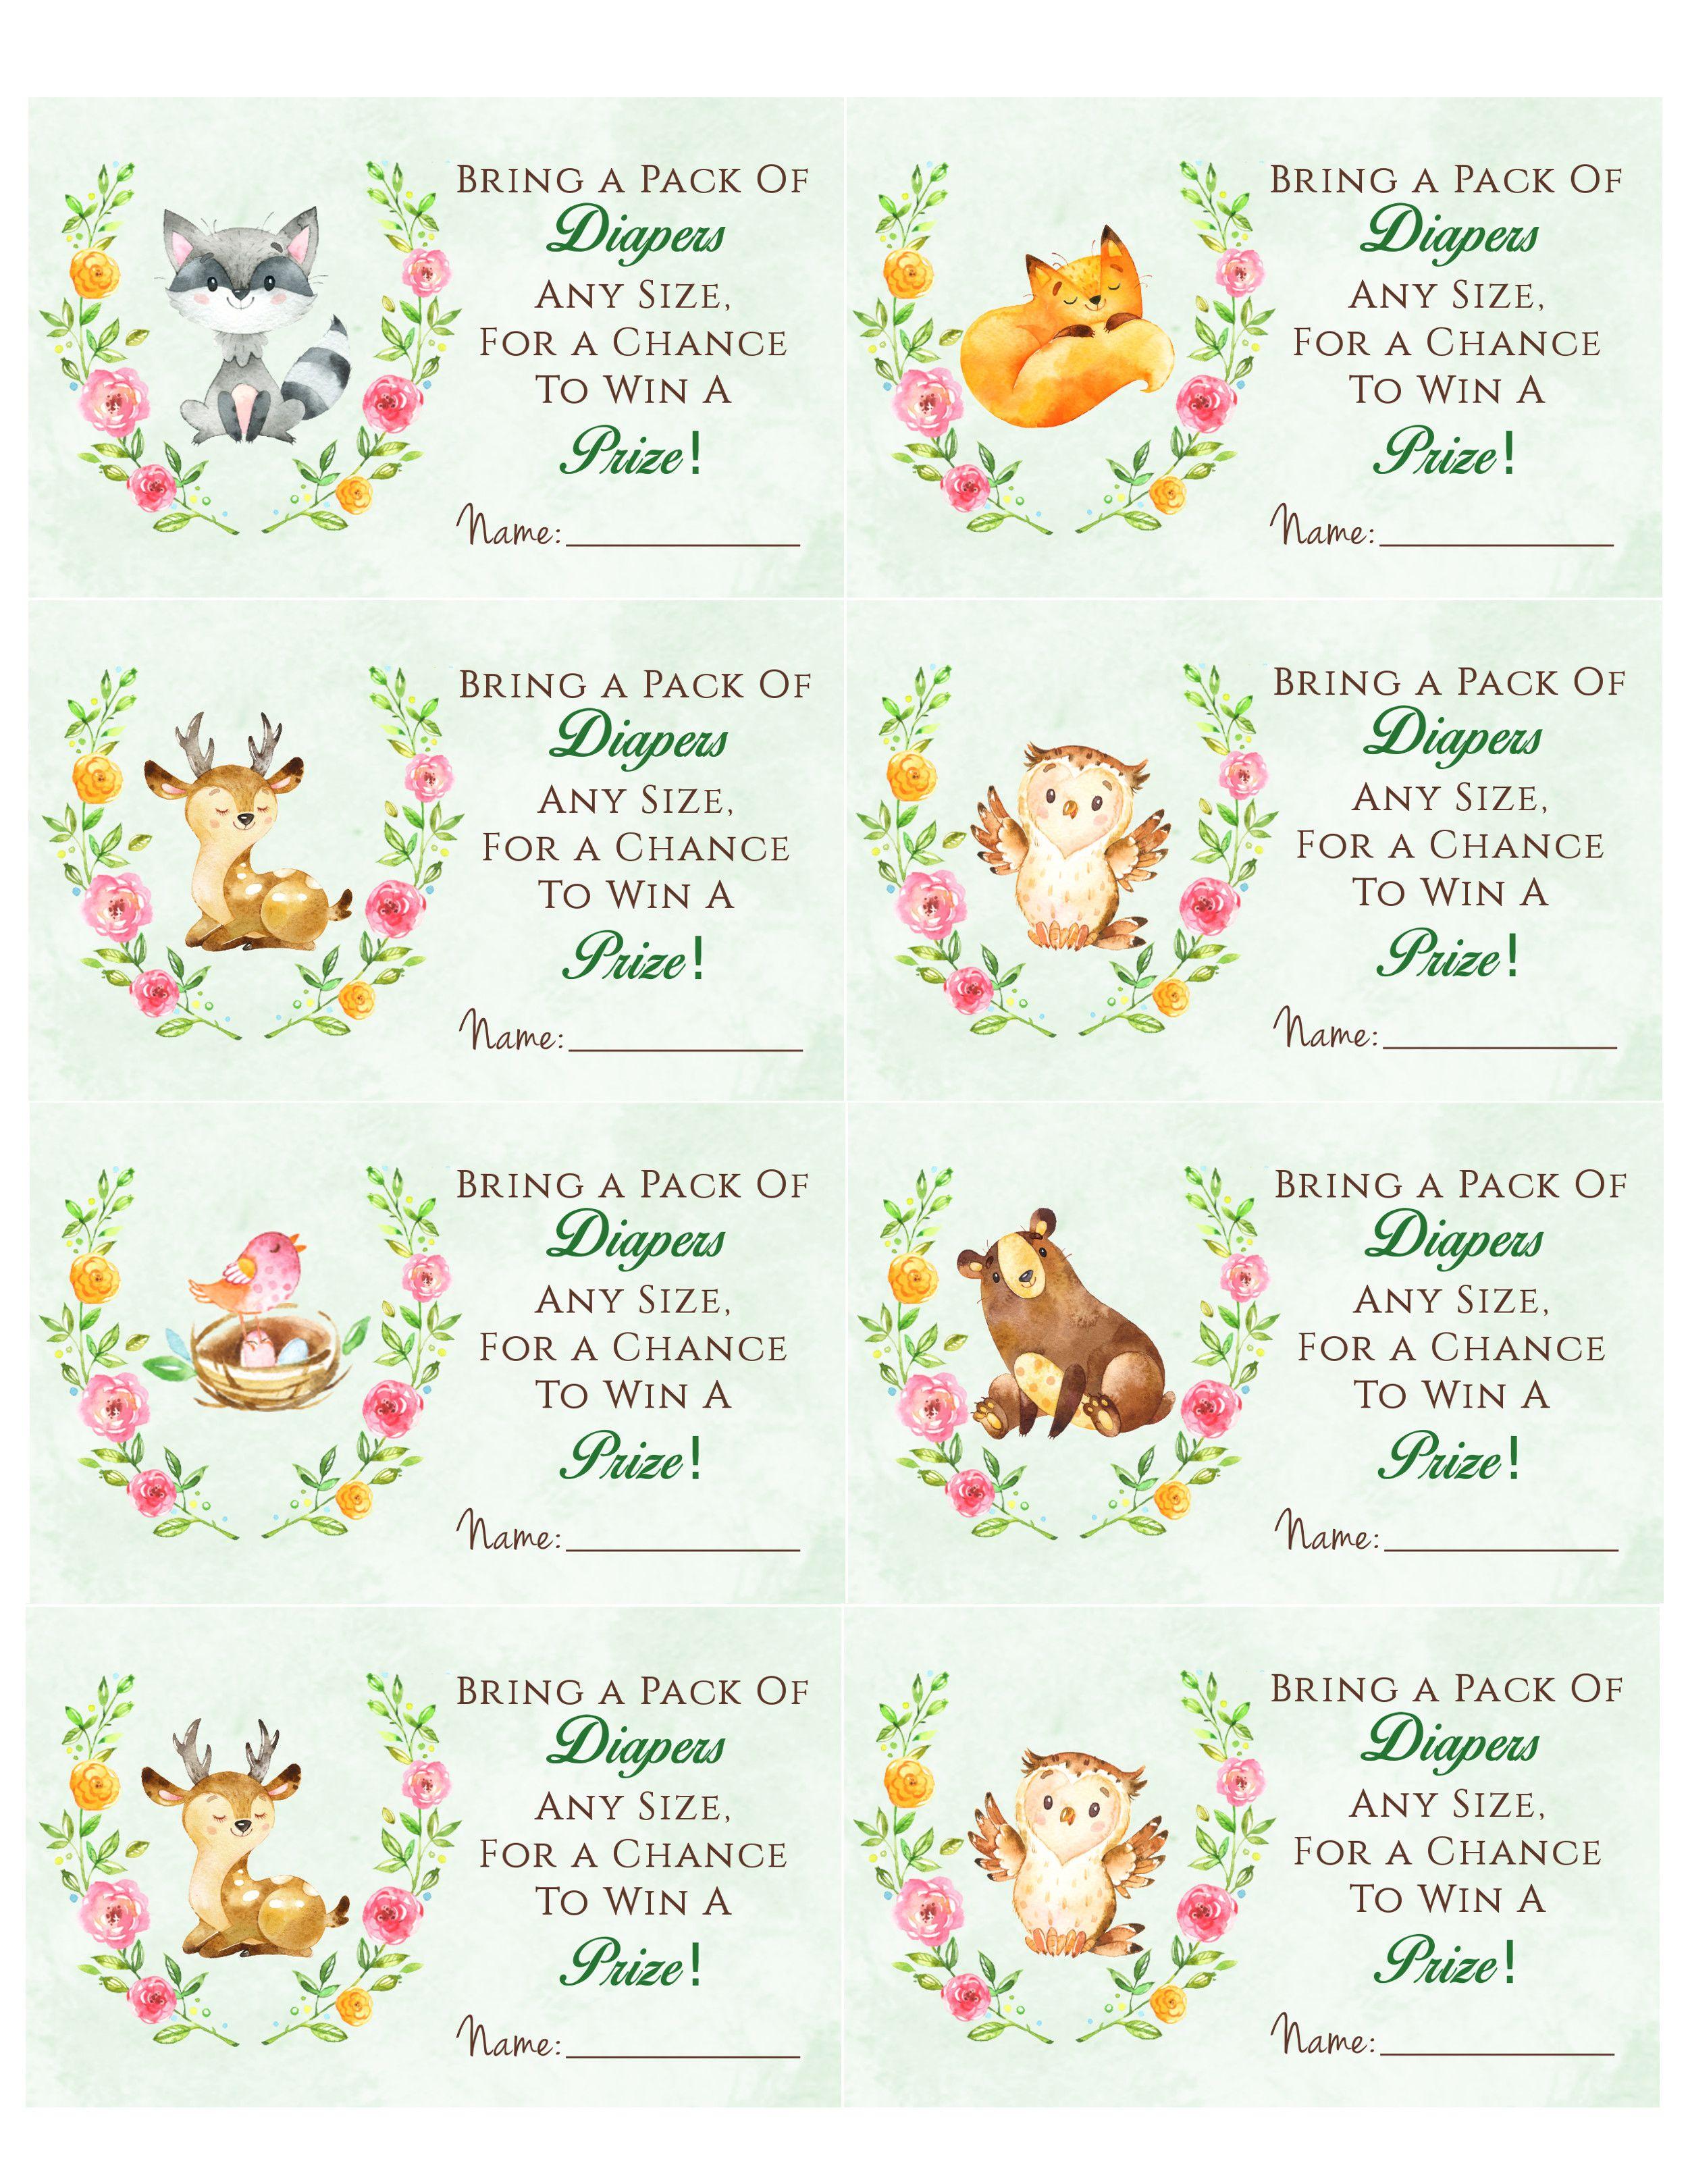 Woodland Animal Baby Shower Diaper Raffle. Free Printable | Birthday - Free Printable Baby Shower Diaper Raffle Tickets